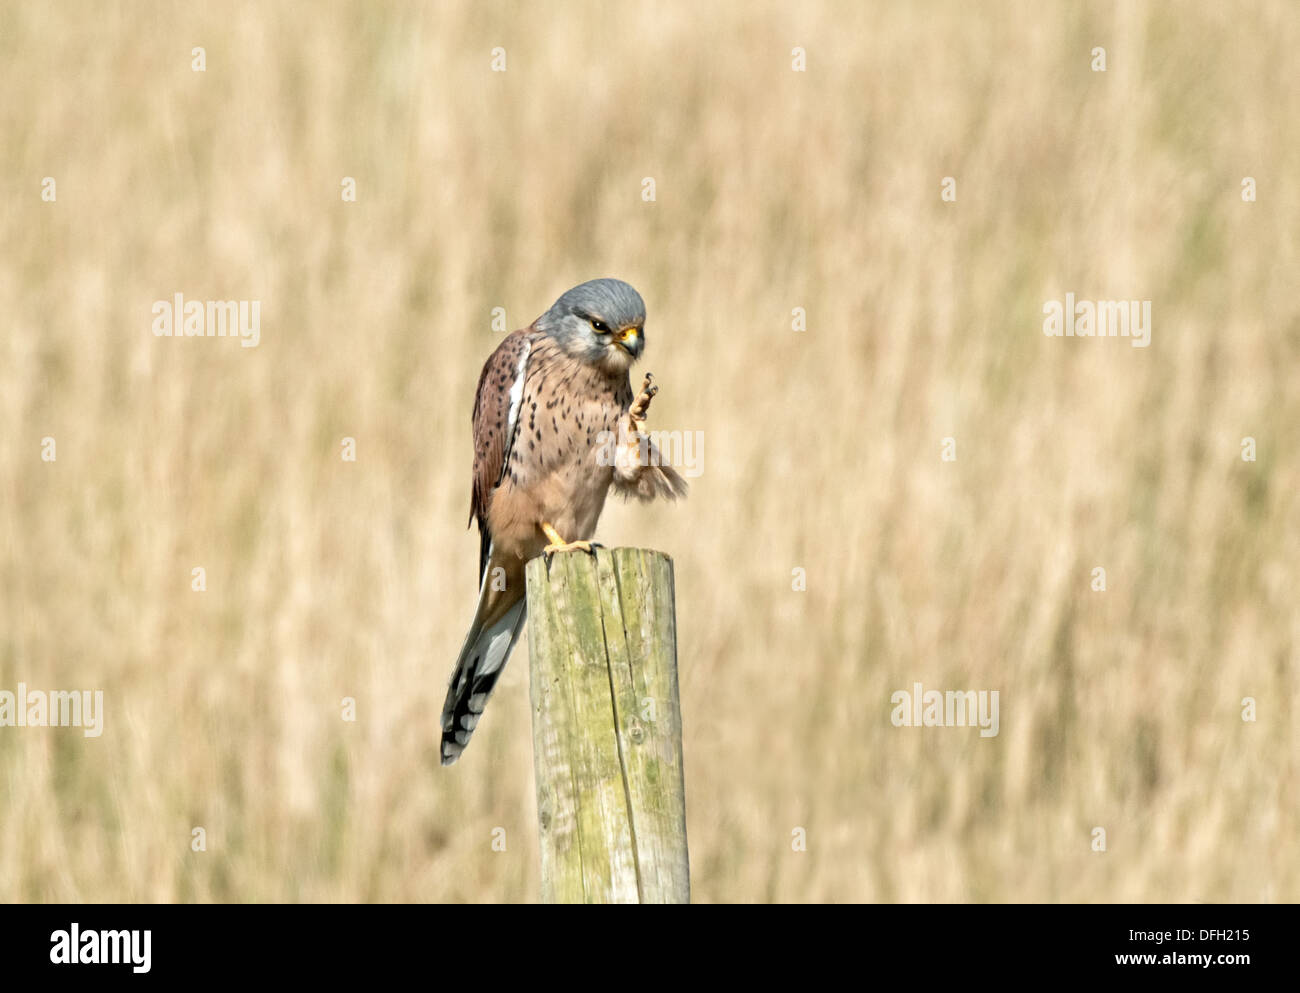 Male Kestrel, Falco-tinnunculus Perches On Fence Post Preening. Uk - Stock Image